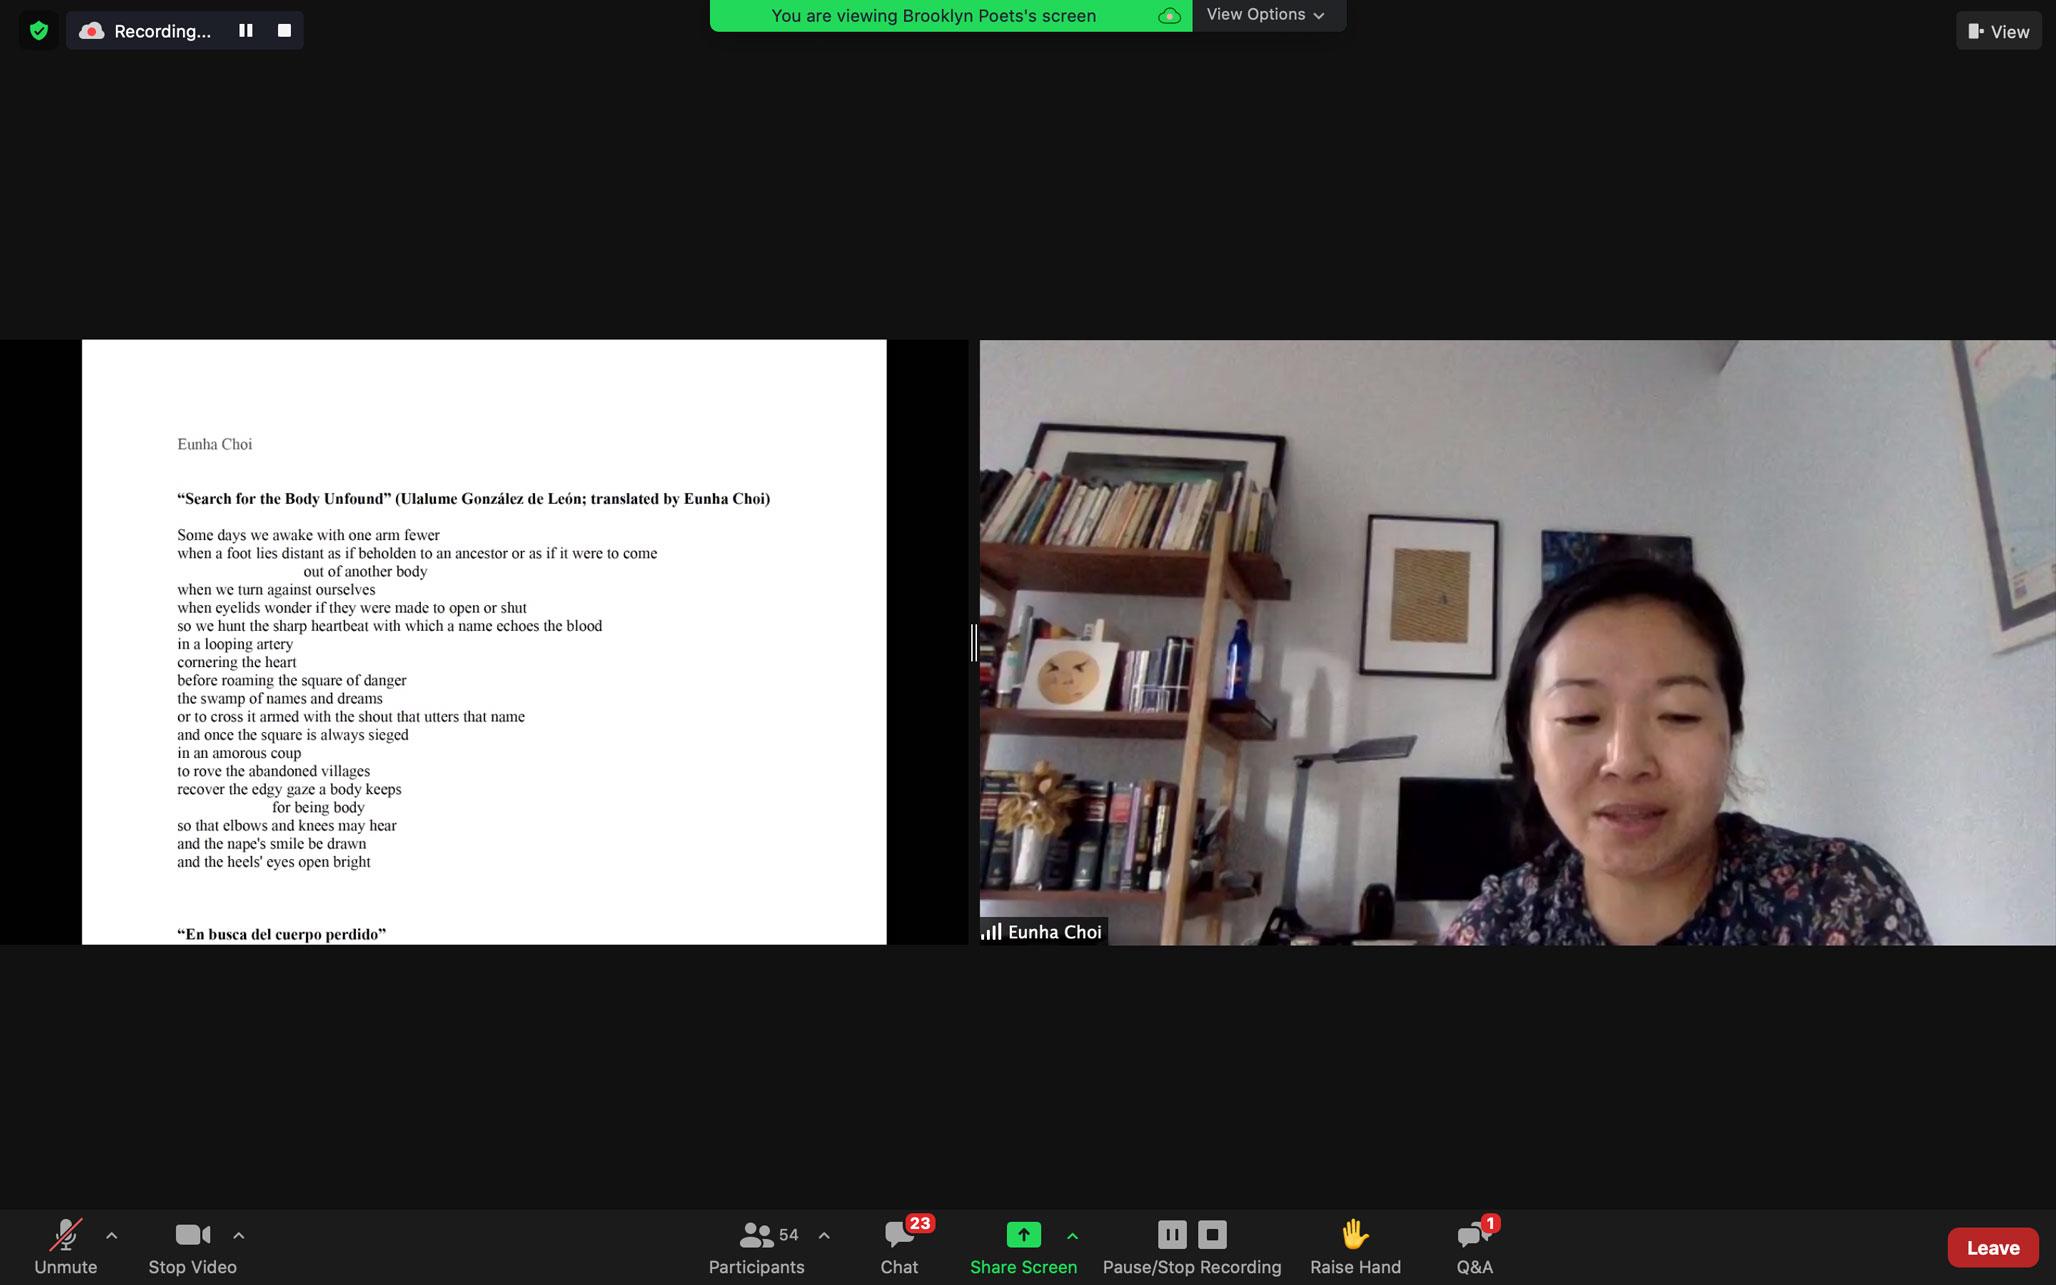 Eunha Cho reads at Brooklyn Poets Workshop Showcase